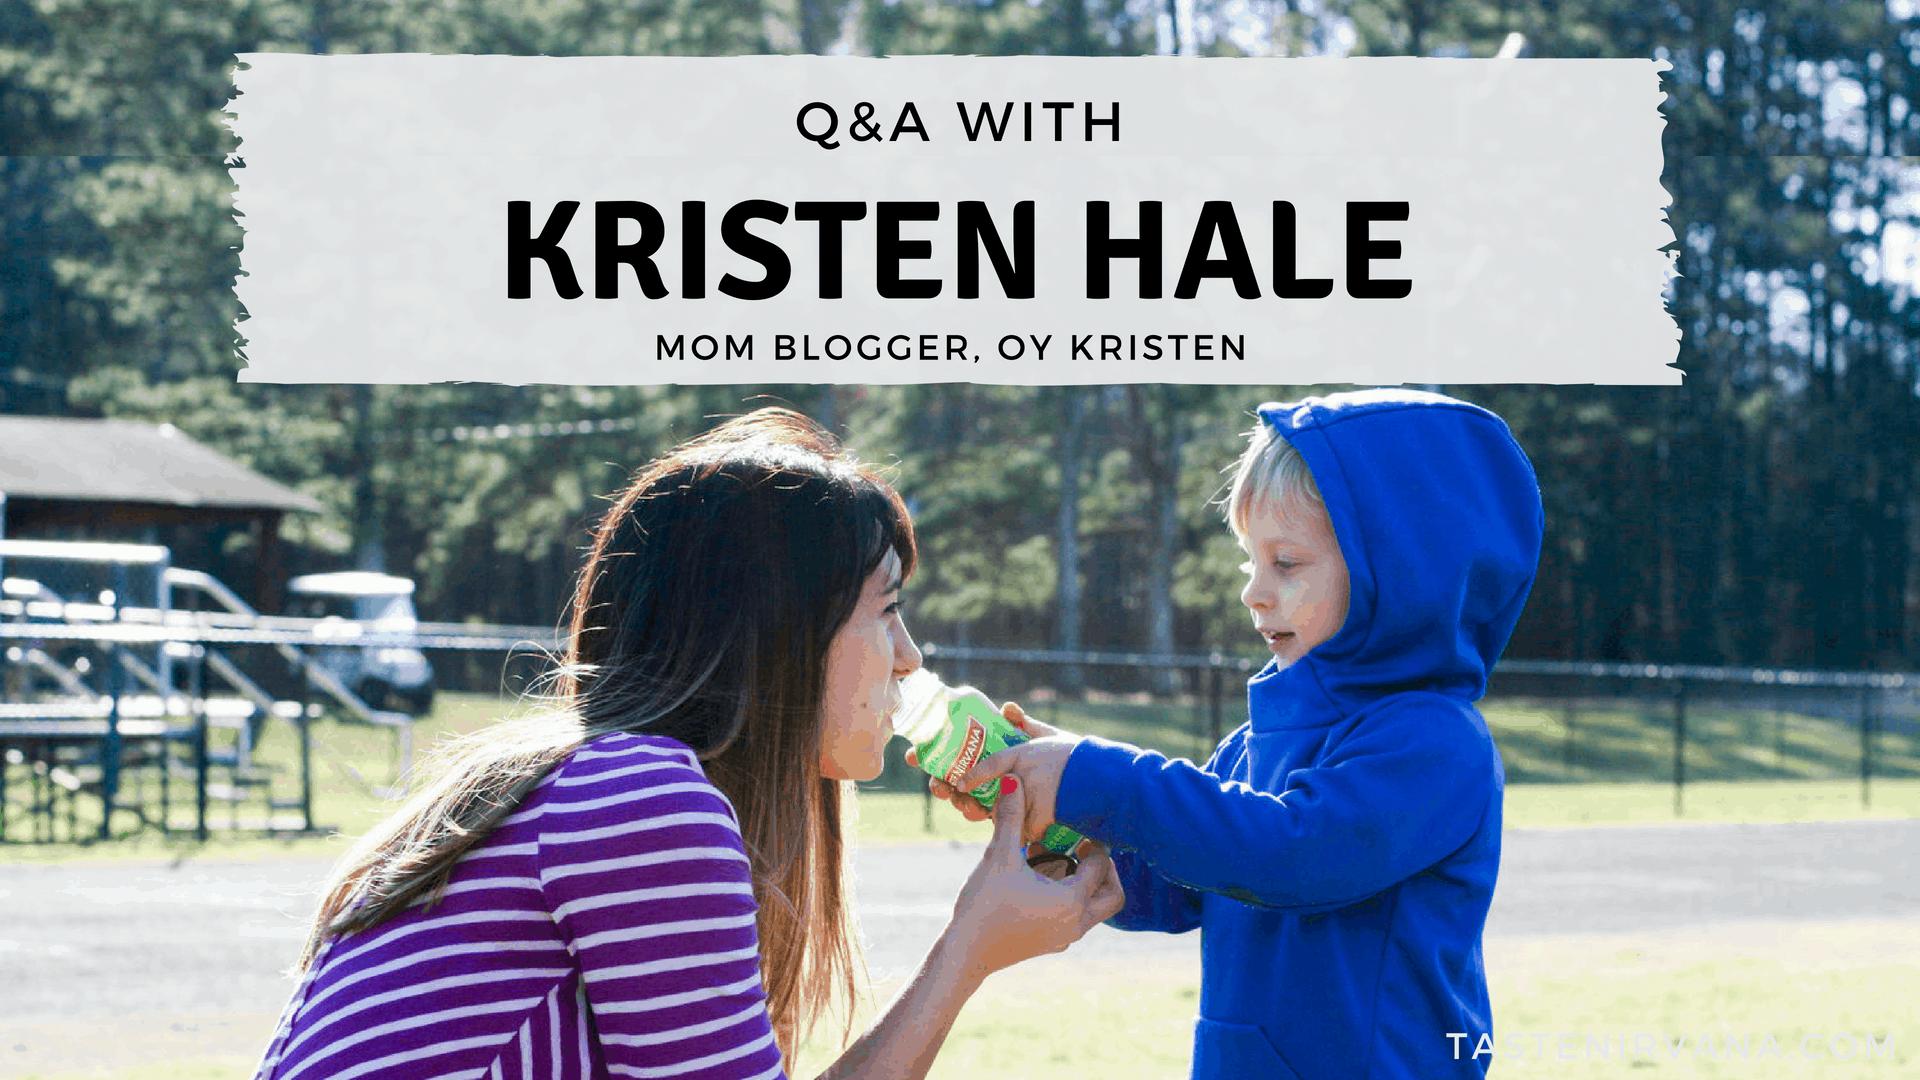 Blog Cover - Q&A with Mon Blogger Kristen Hale